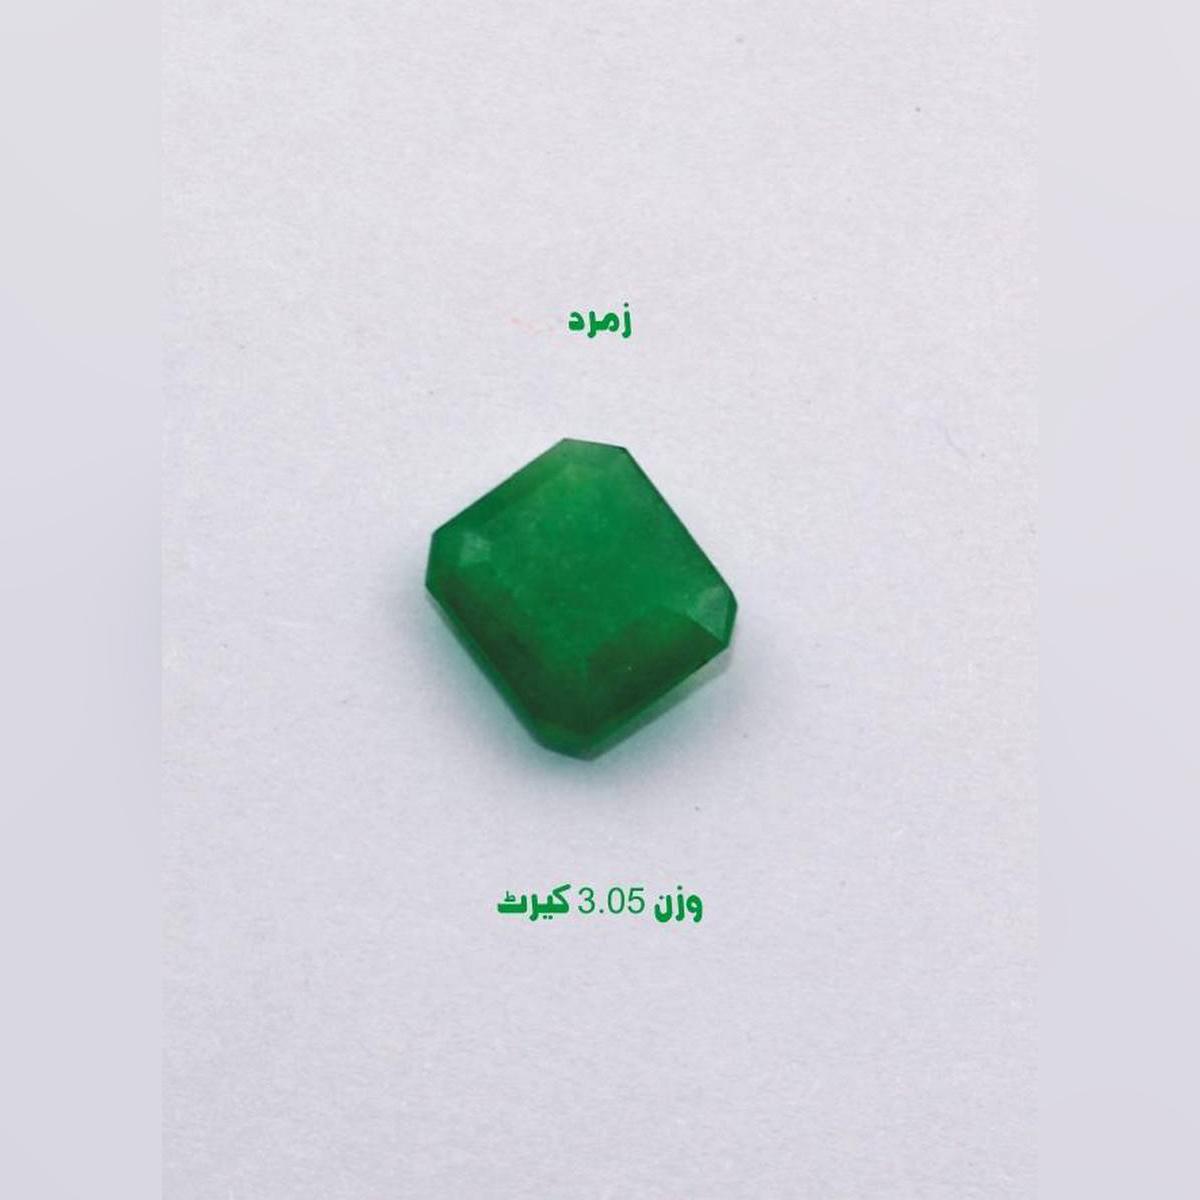 Zamurd (Emerald) Gemstone Weight 3.05 Carat